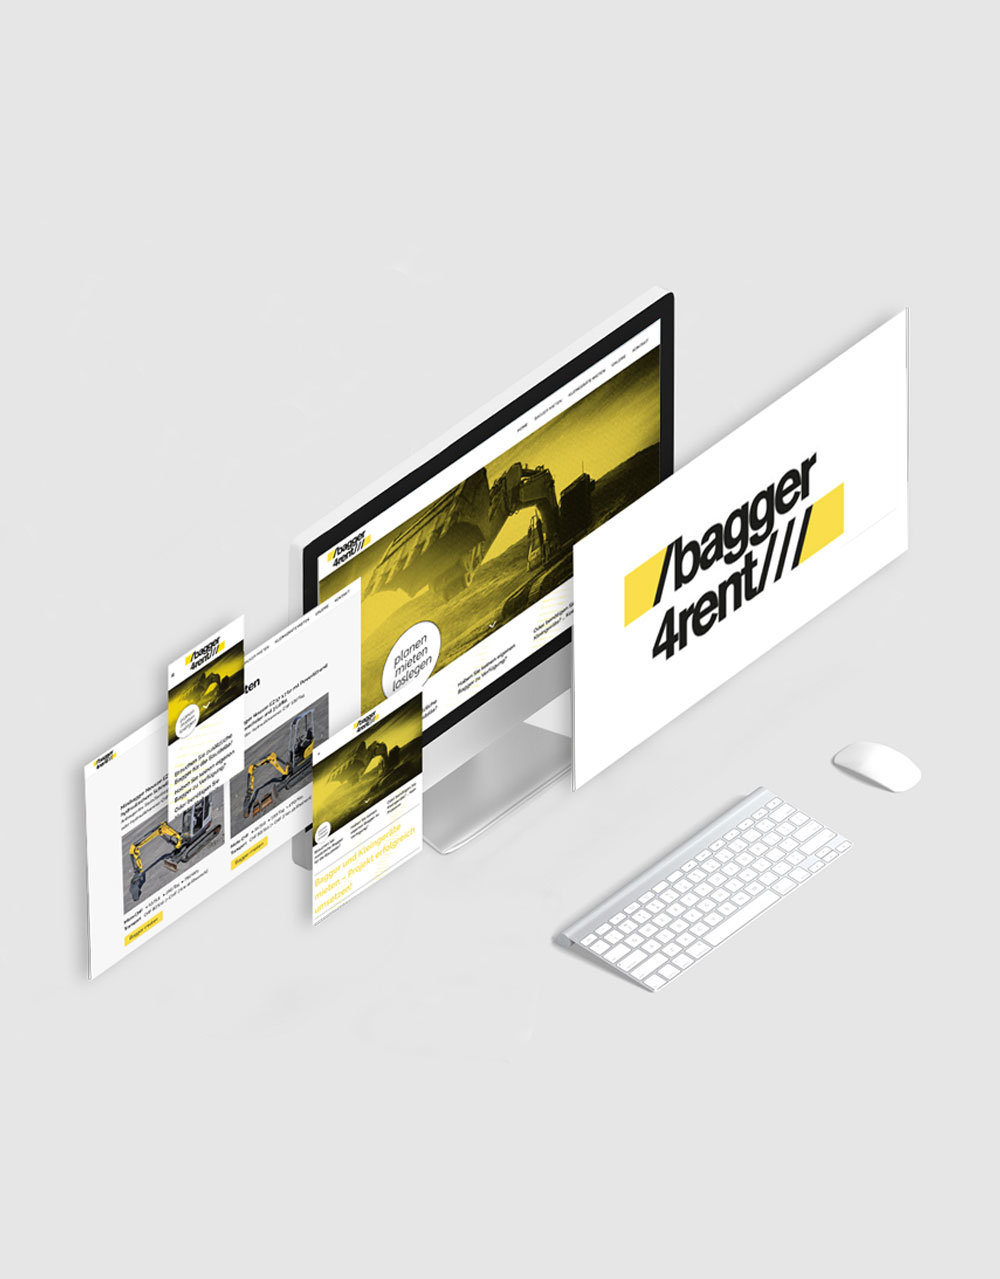 Dokumentation, Corporate Design, www.bagger4rent.ch, bagger4rent, Vorschau